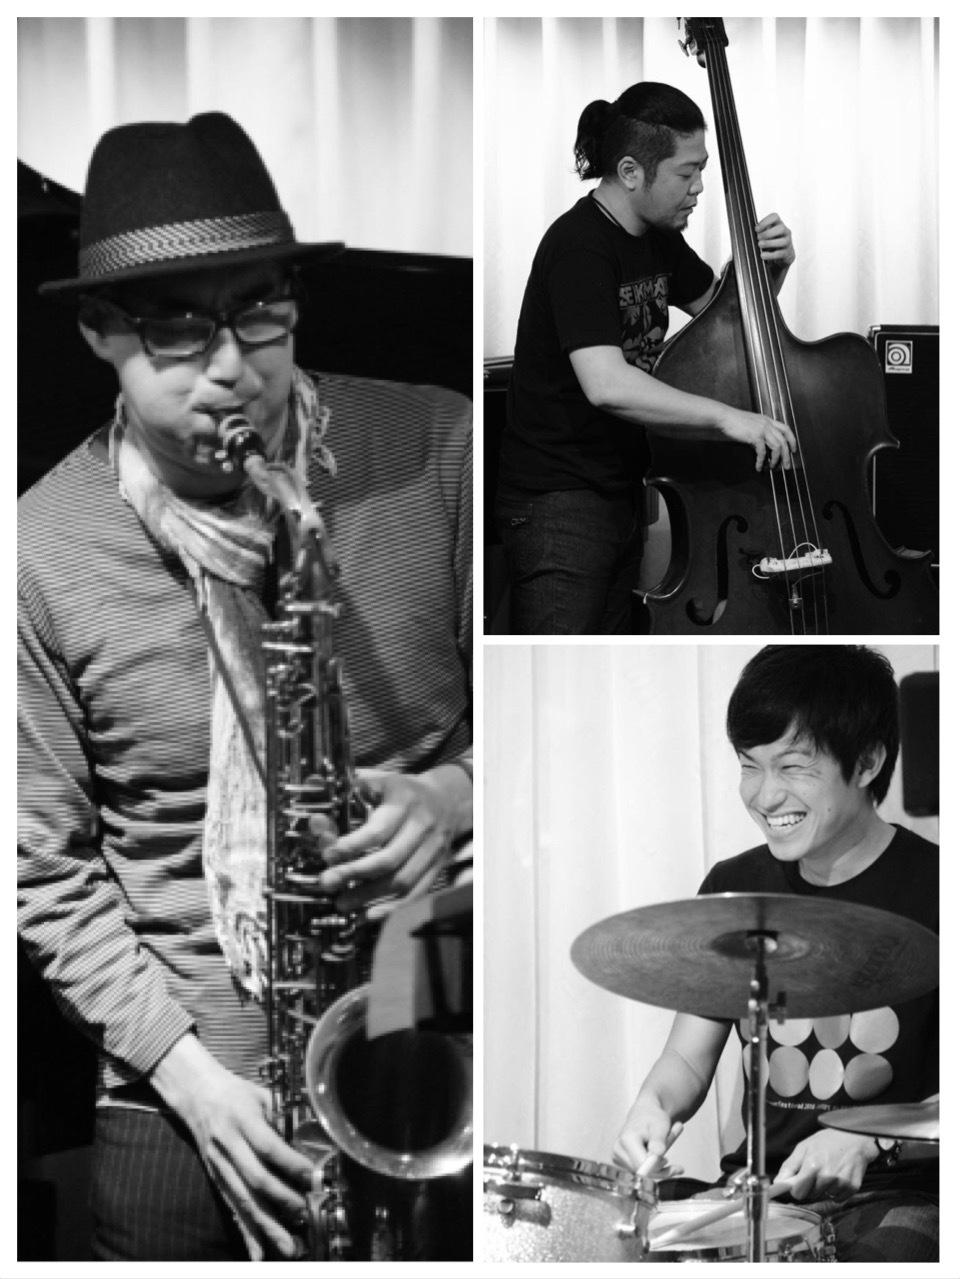 Jazzlive Cominジャズライブカミン 広島 本日4月6日火曜日のジャズライブ_b0115606_12460383.jpeg